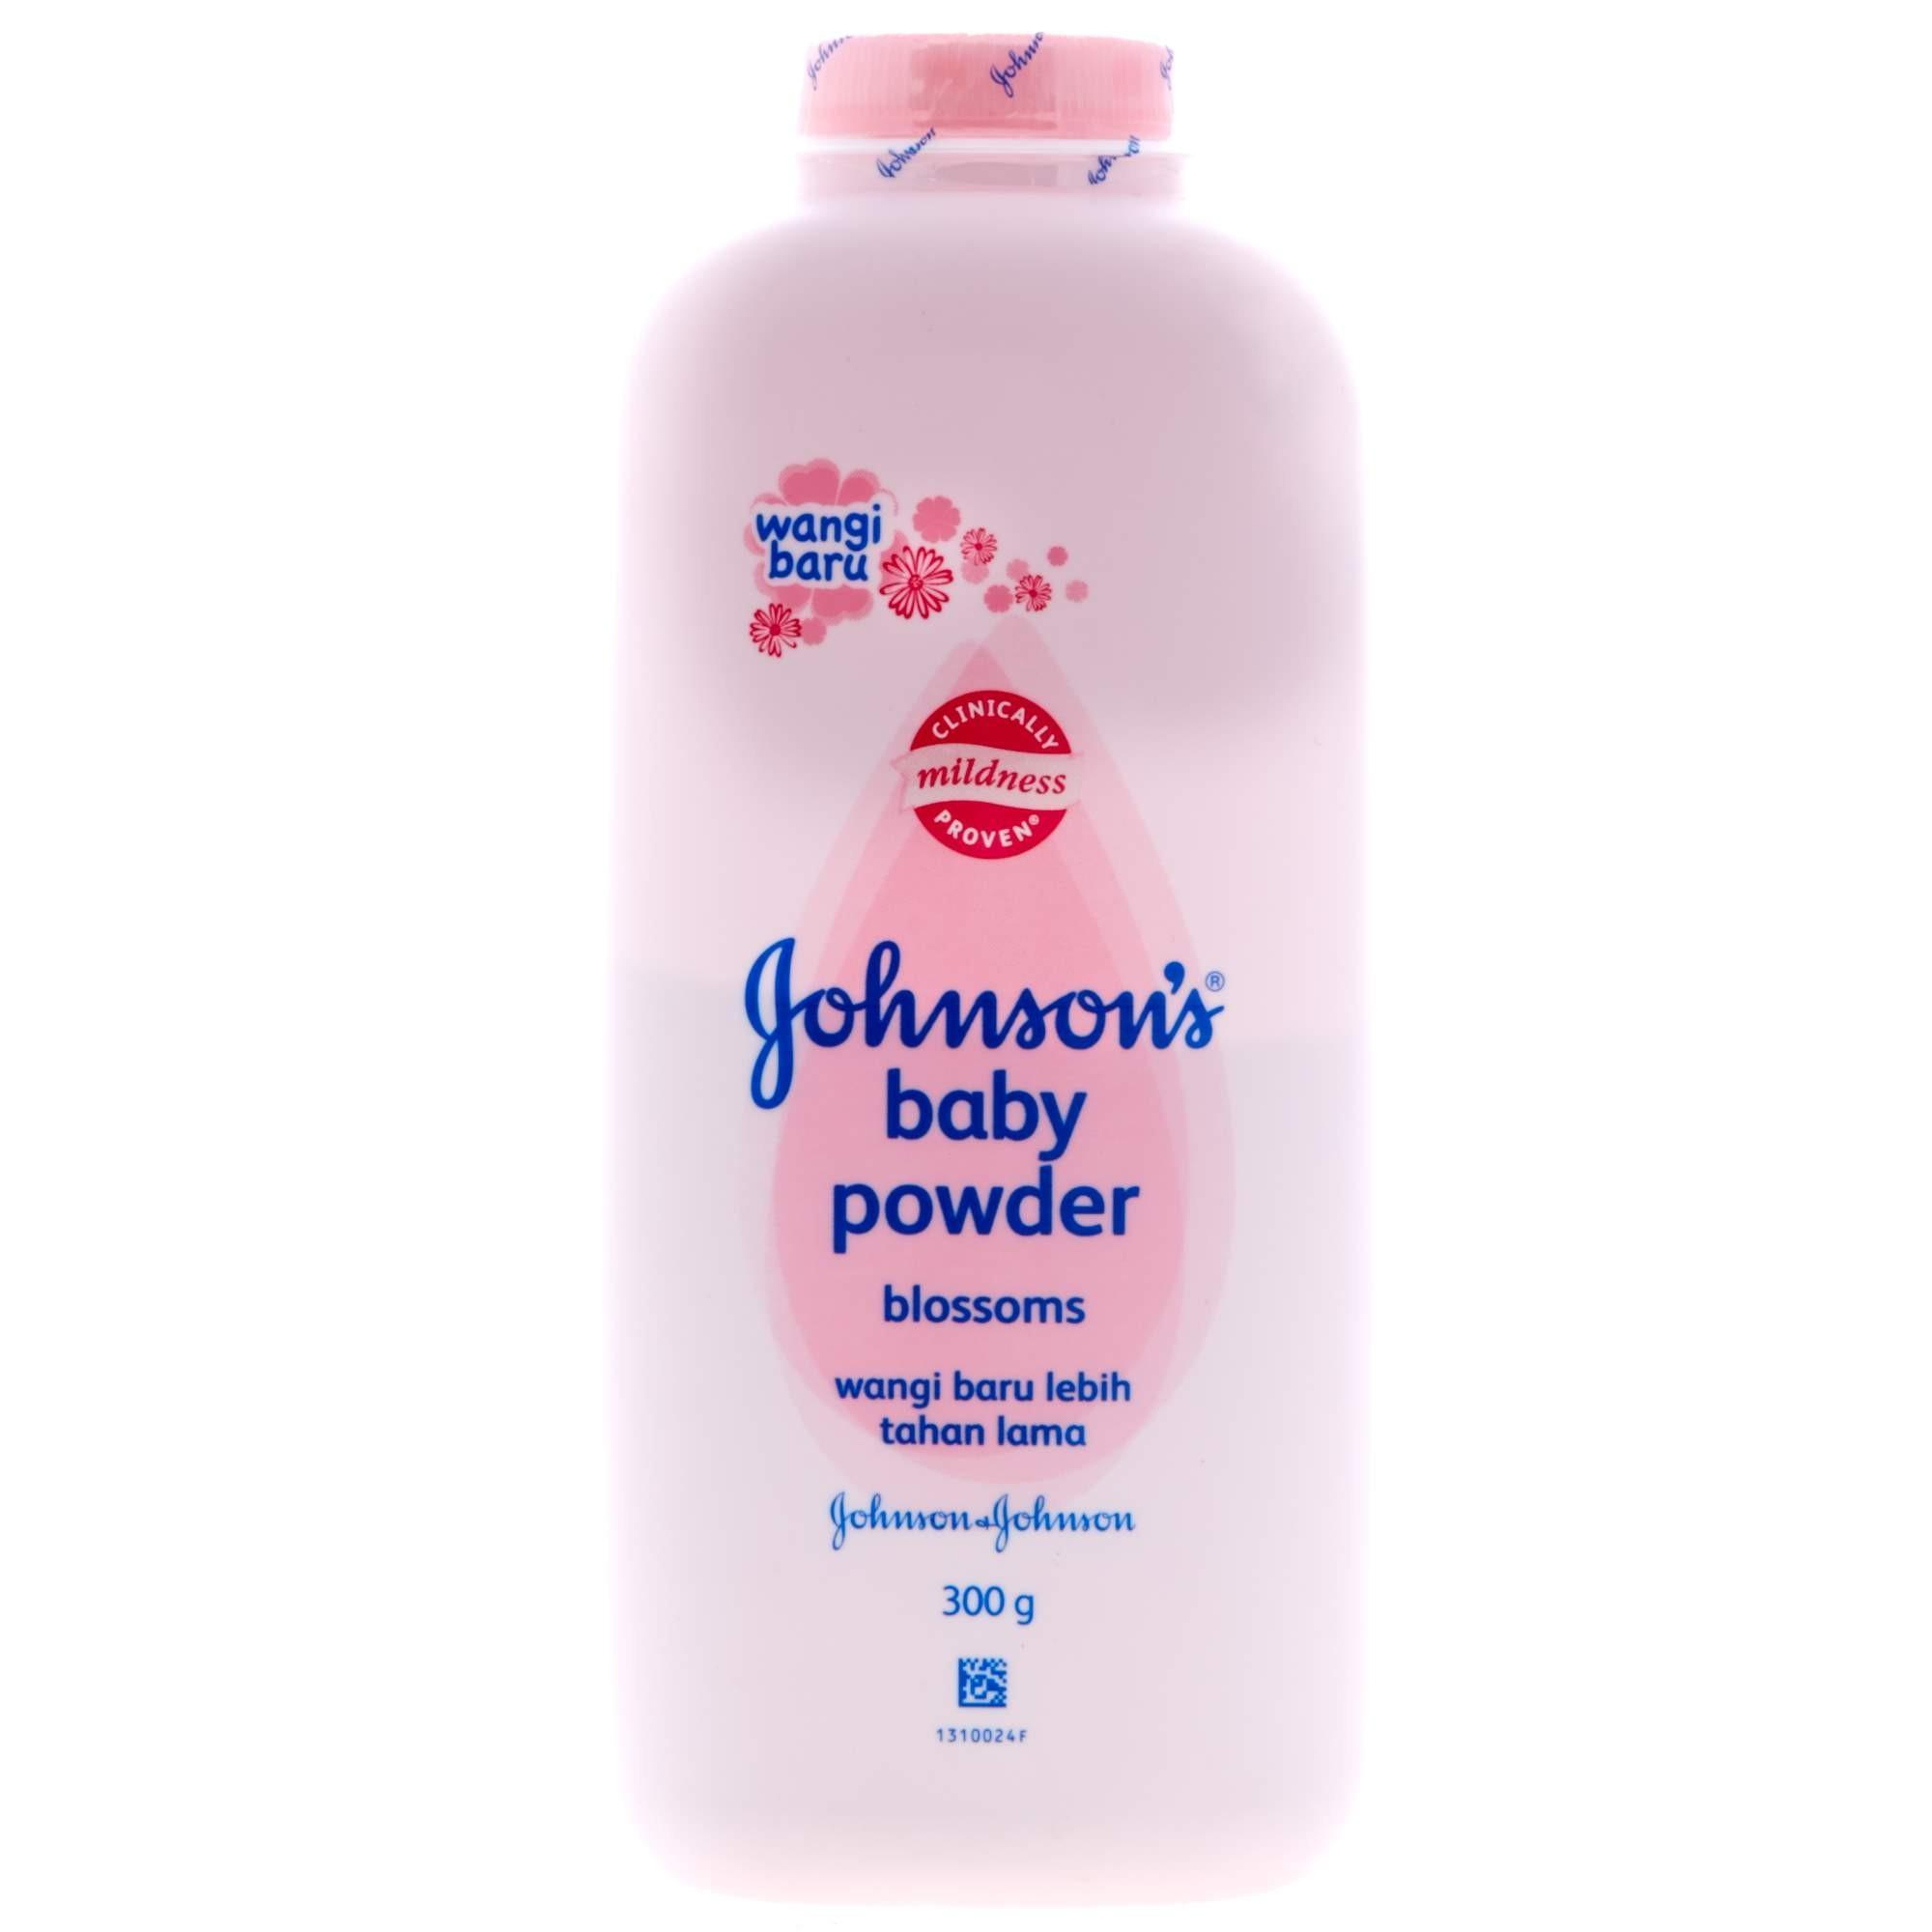 Fitur Johnsons Baby Cream 50g Dan Harga Terbaru Info Johnson Powder Blossom 300gr